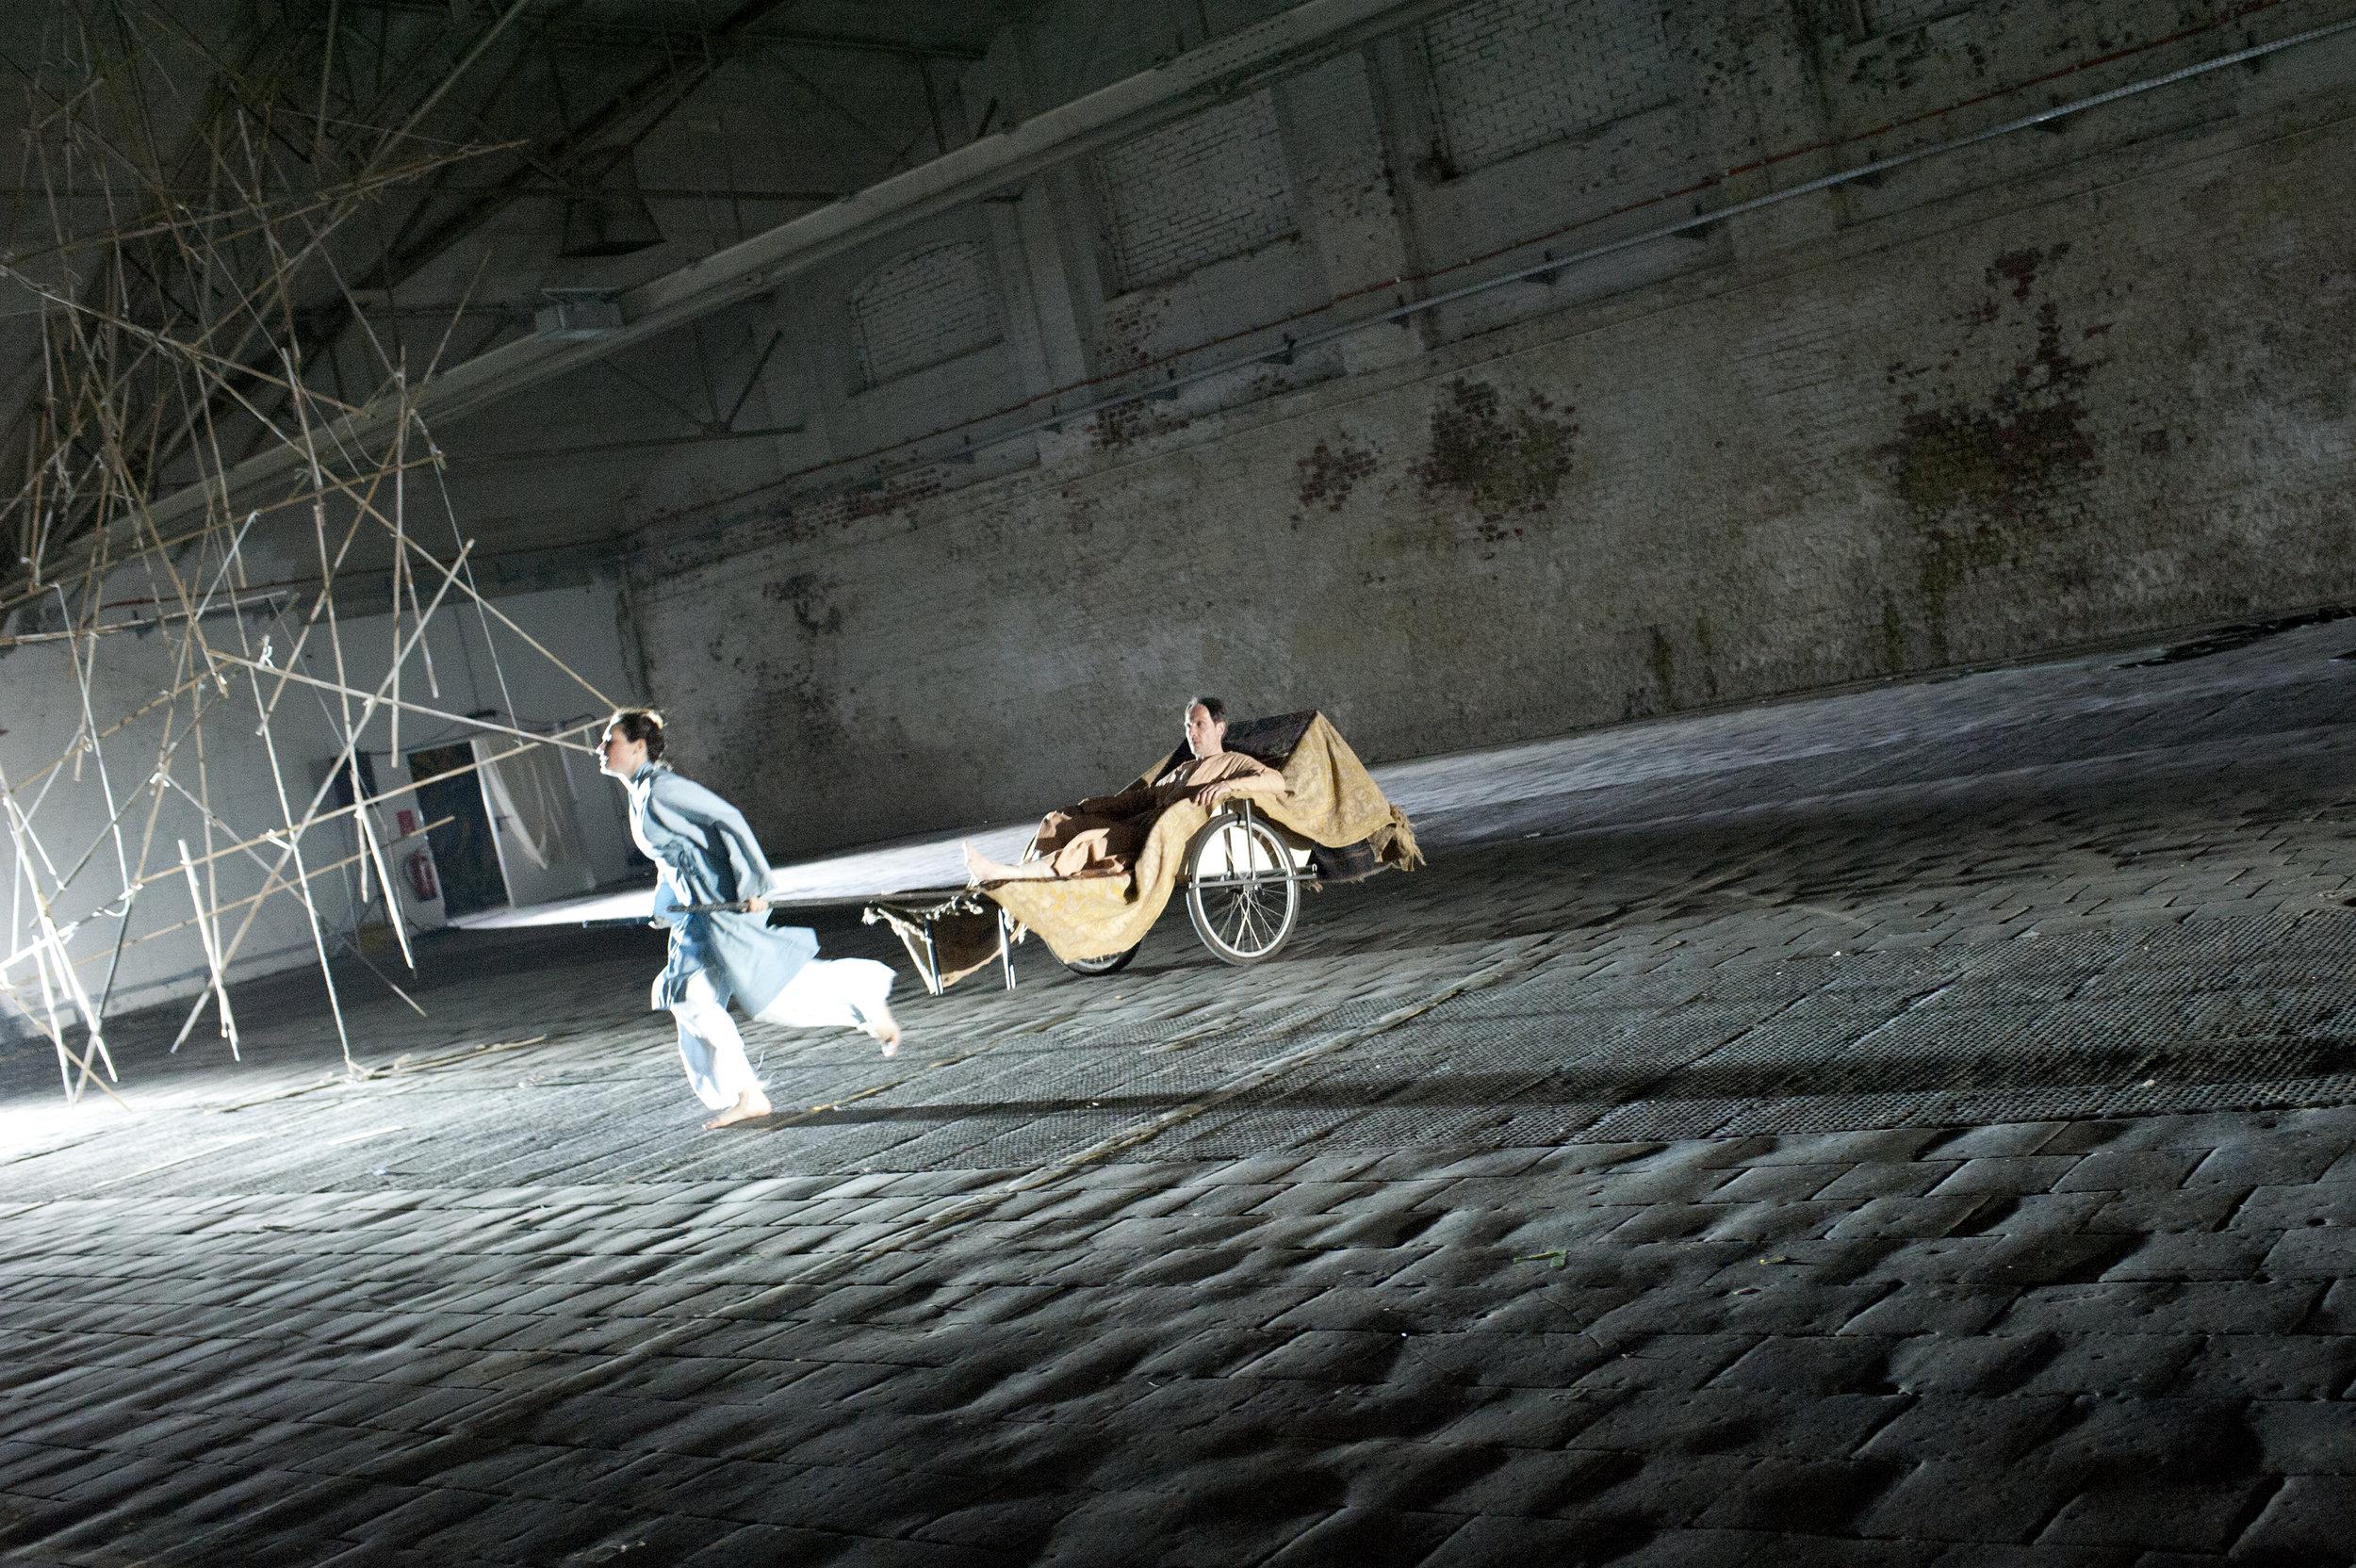 Vita activa oder Das denkende Herz - BAHAMUT productions - Expedithallhttps://silk.at/for-a/e, Wien